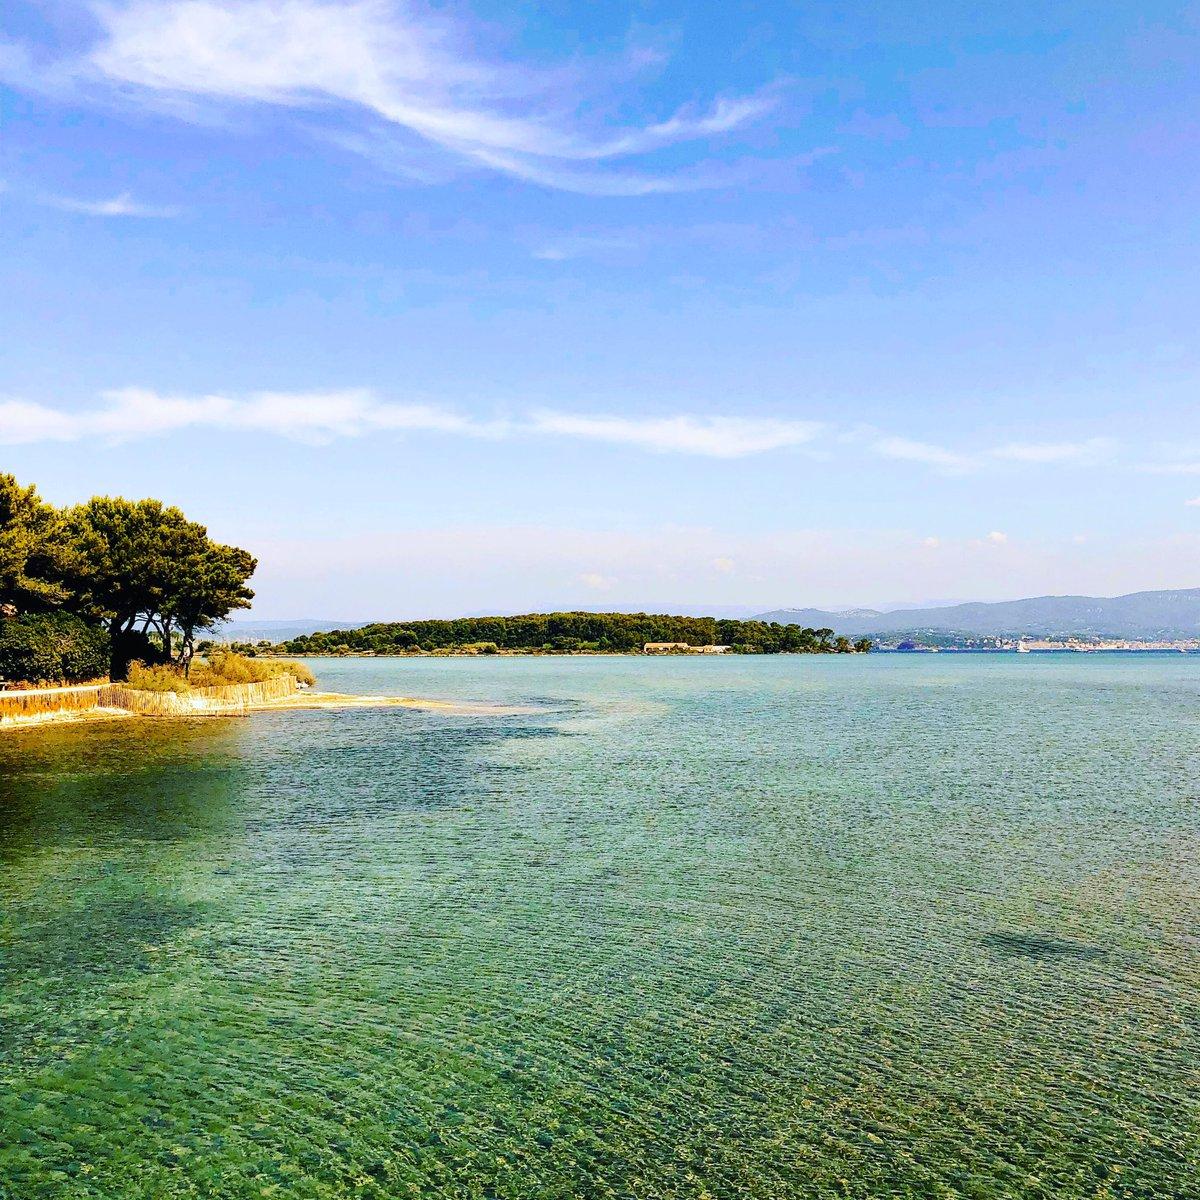 Nature préservée 👀👁. #iledesembiez #island #blue #vartourisme #var #cotedazurfrance @visitcotedazur #picoftheday #photography #photooftheday #landscape #ecologie #weekend #holiday #sea #mediterranean #france_holidays #cotedazurnow